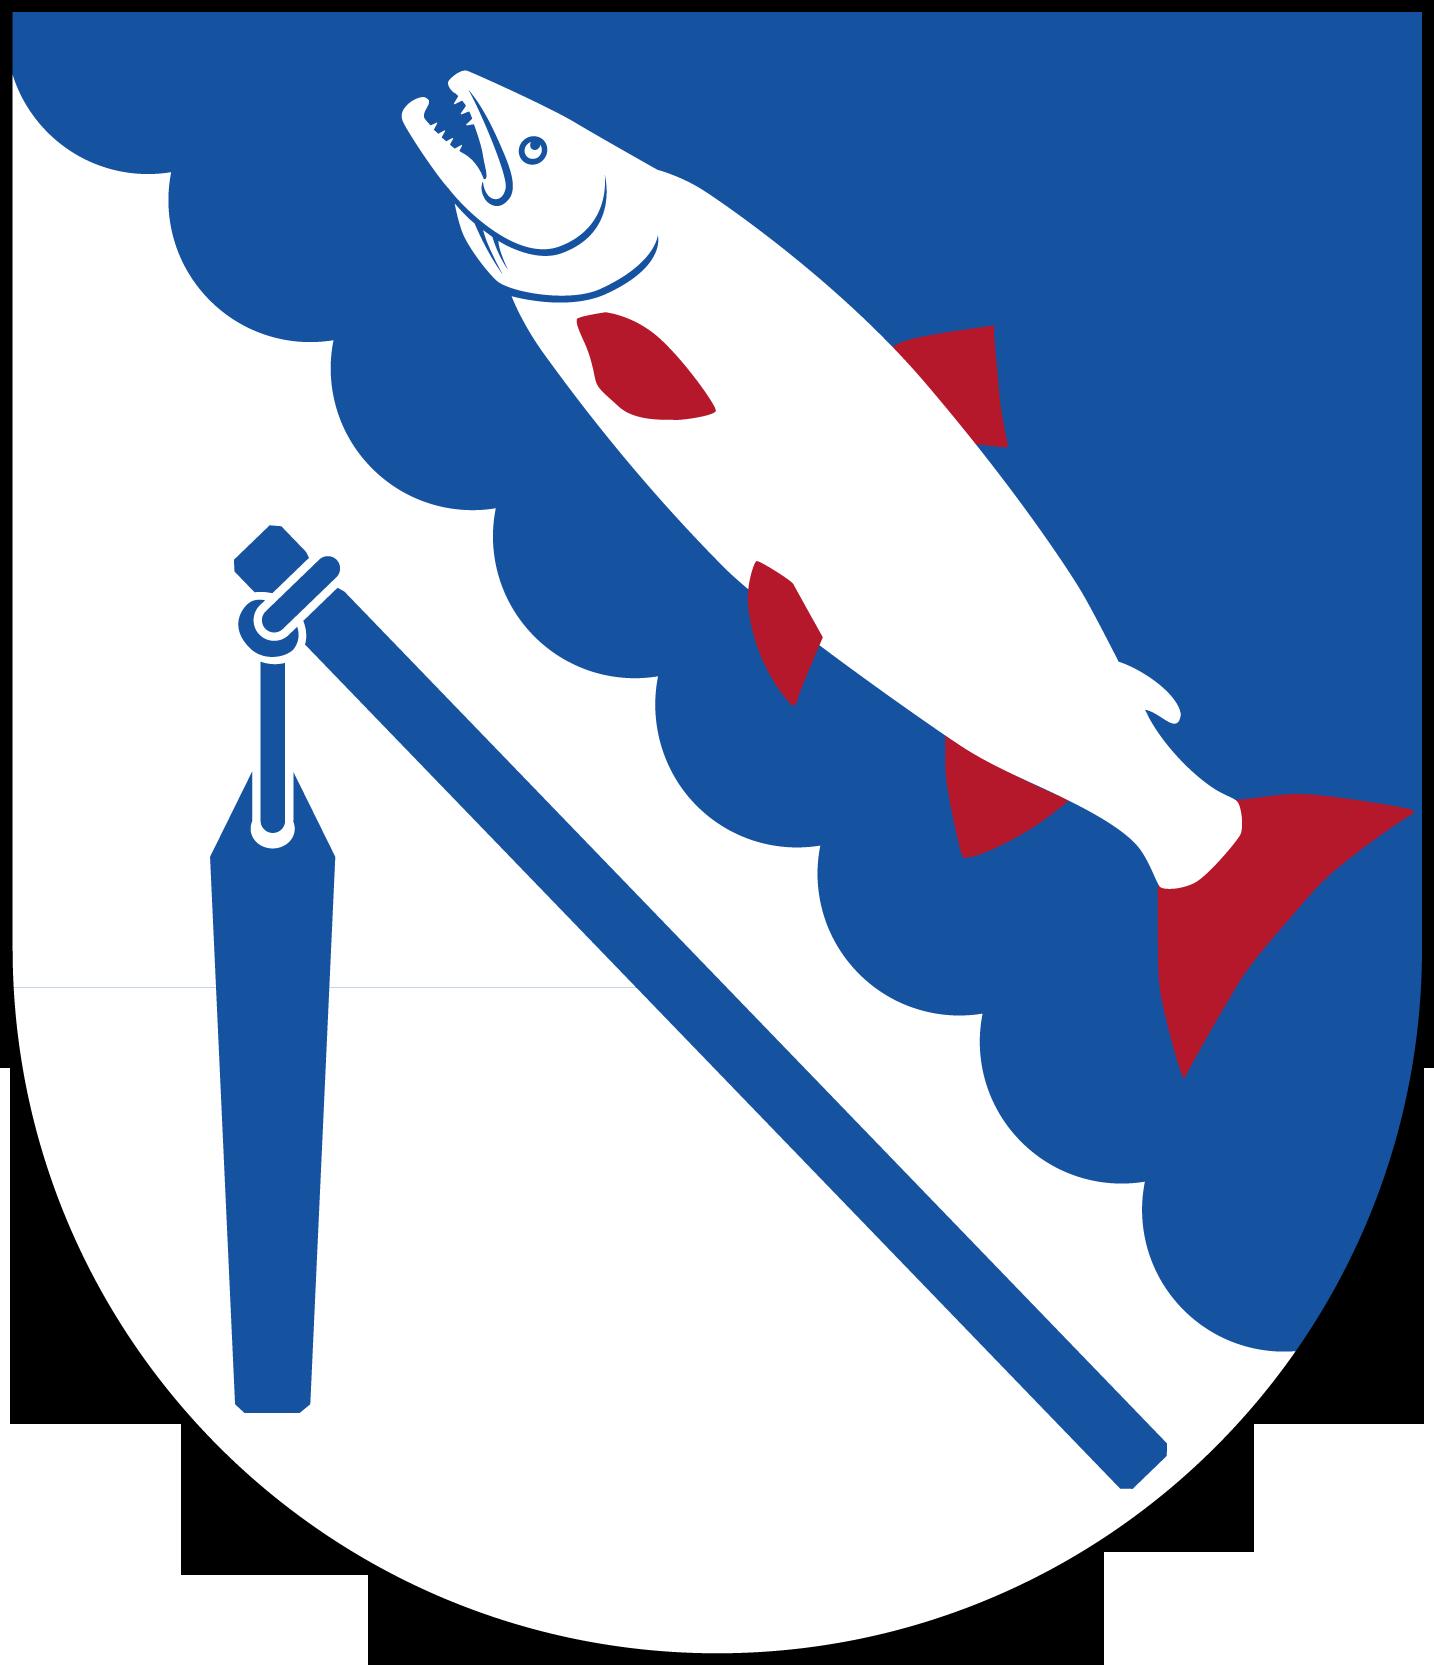 Medlemsfest i Vindelns simhall | Freningen Umenaturist